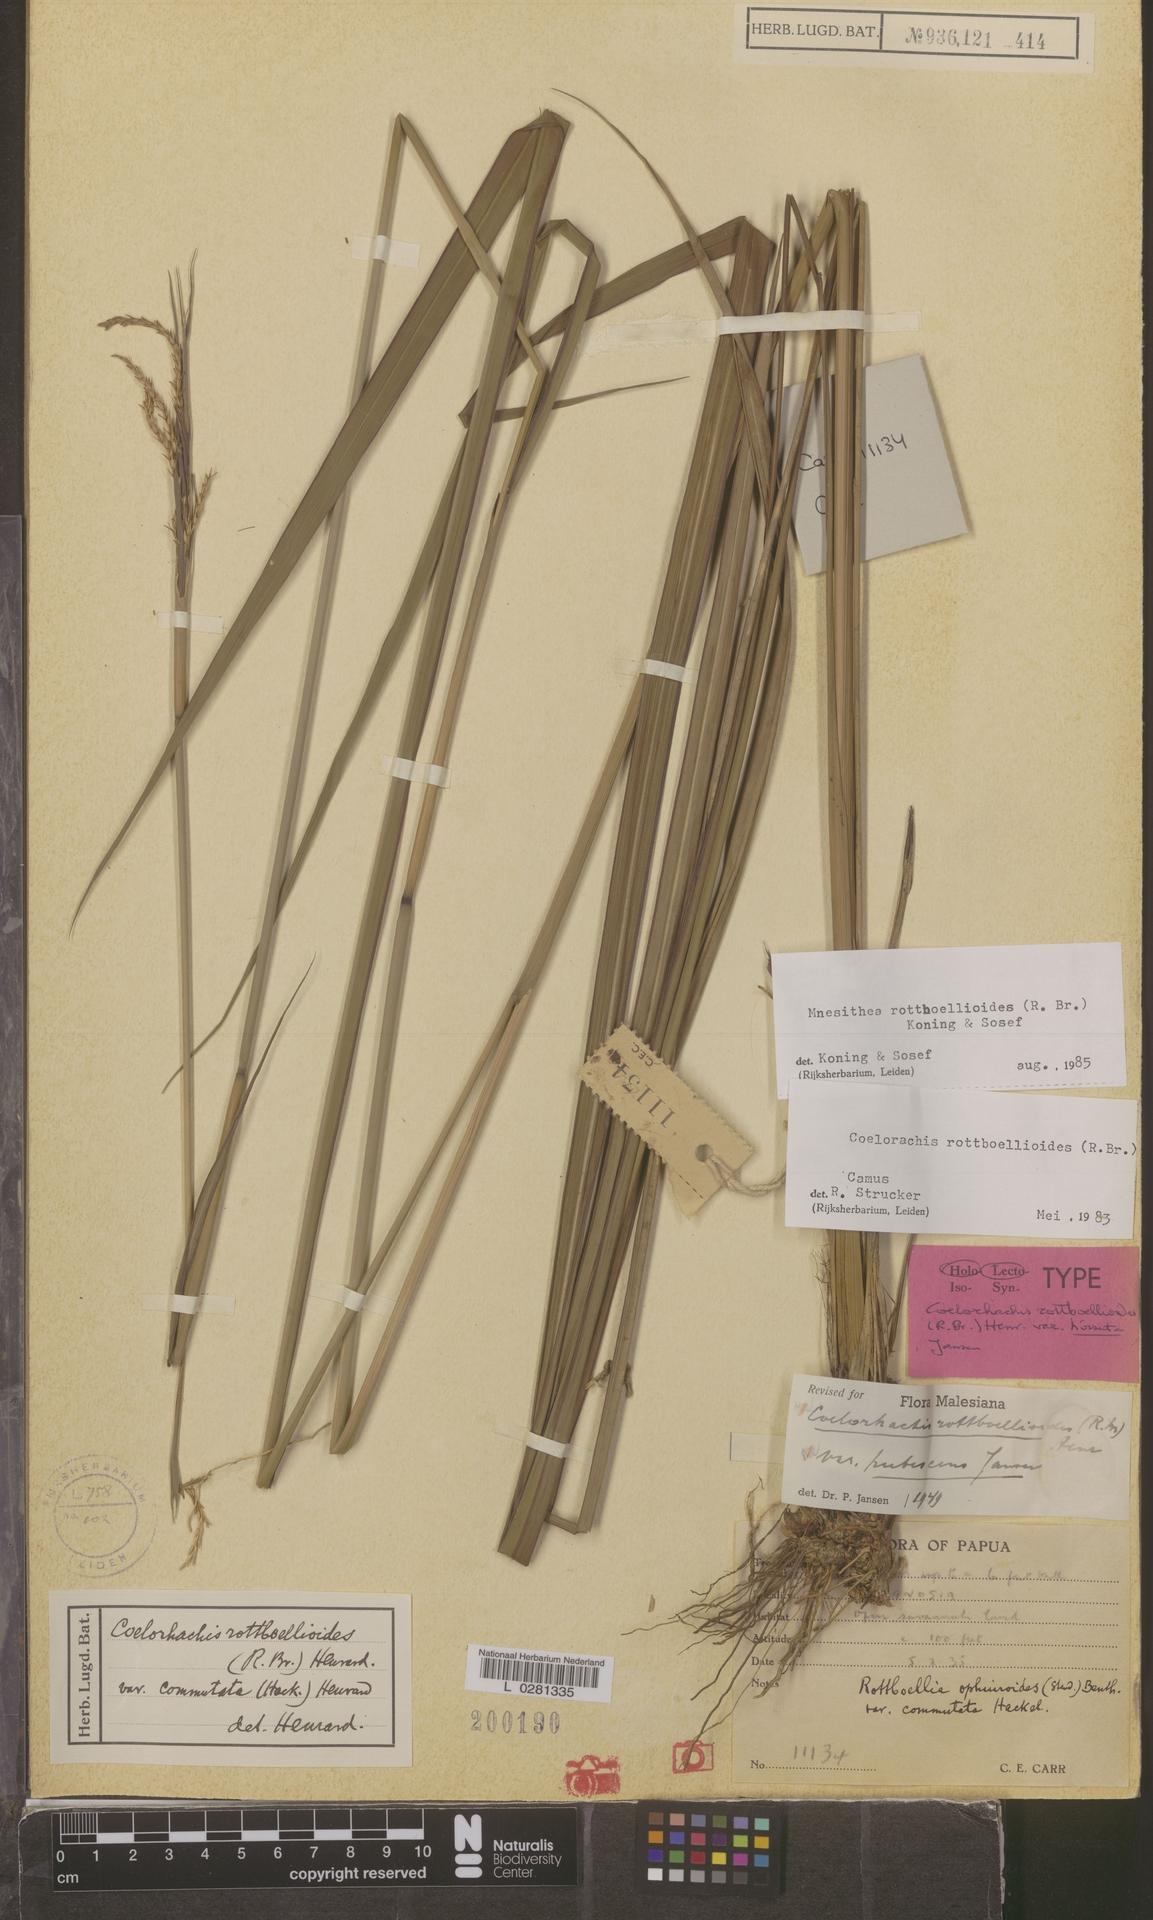 L  0281335 | Mnesithea rottboellioides (R.Br.) de Koning & Sosef